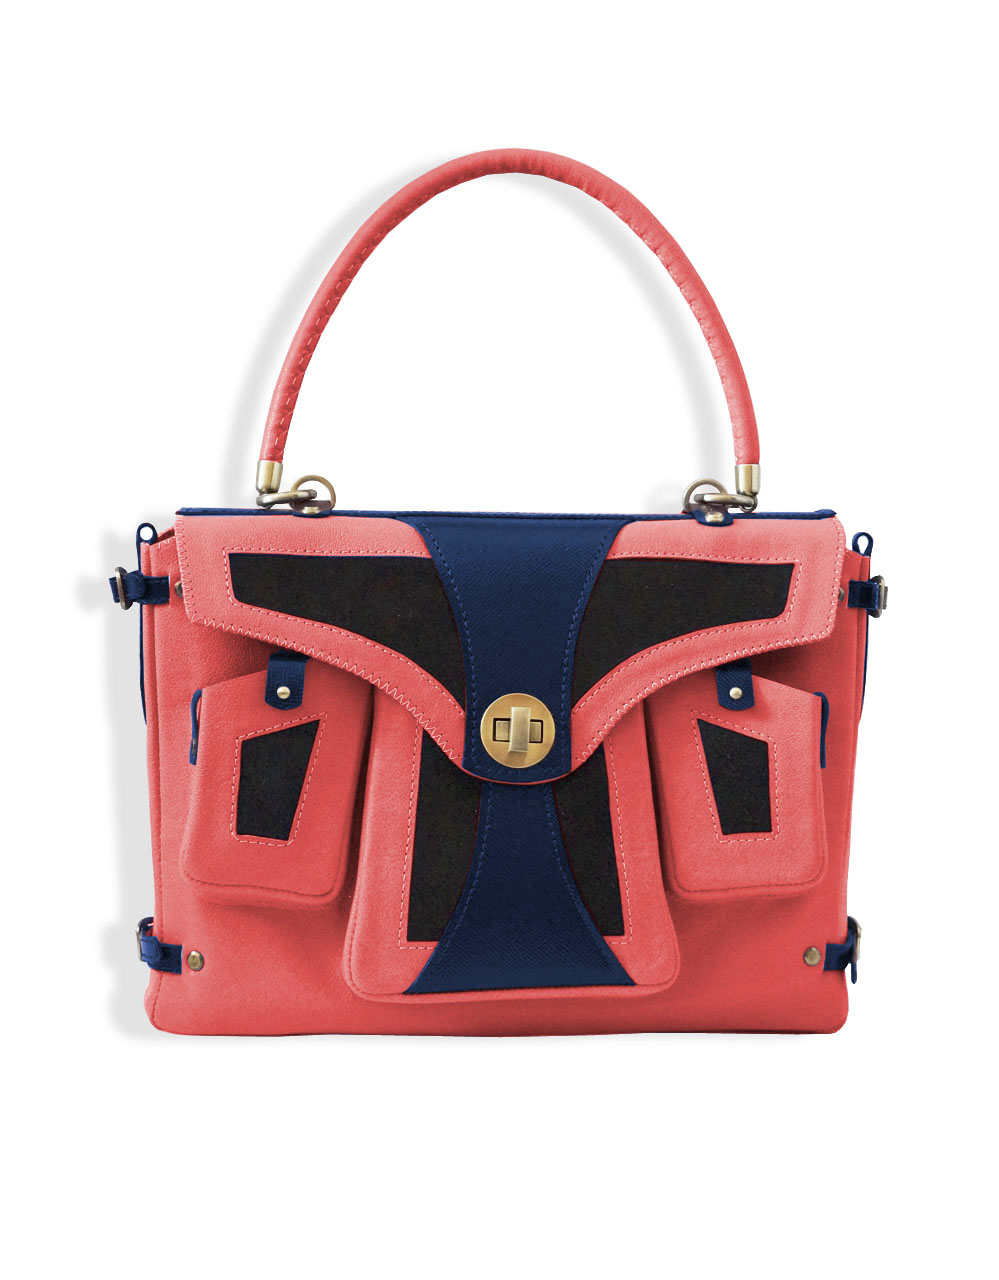 qlare bag for men 2021 fashion